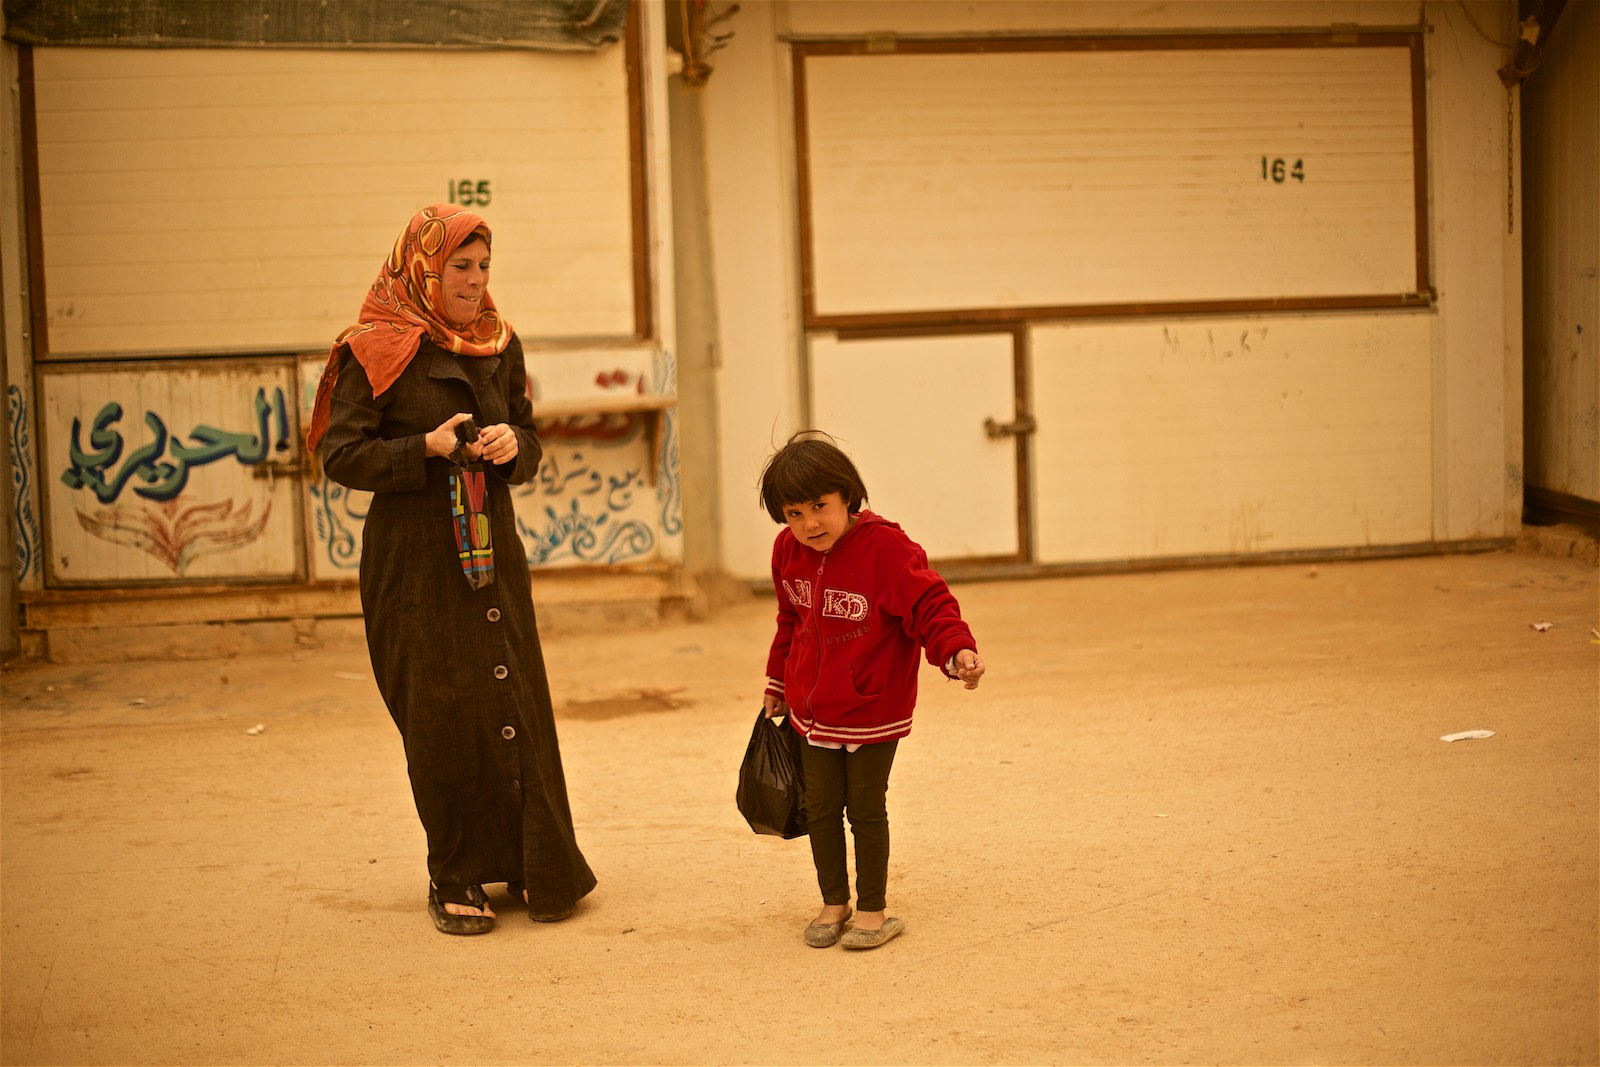 denis-bosnic-zaatari-jordan-refugee-camp-23.jpg